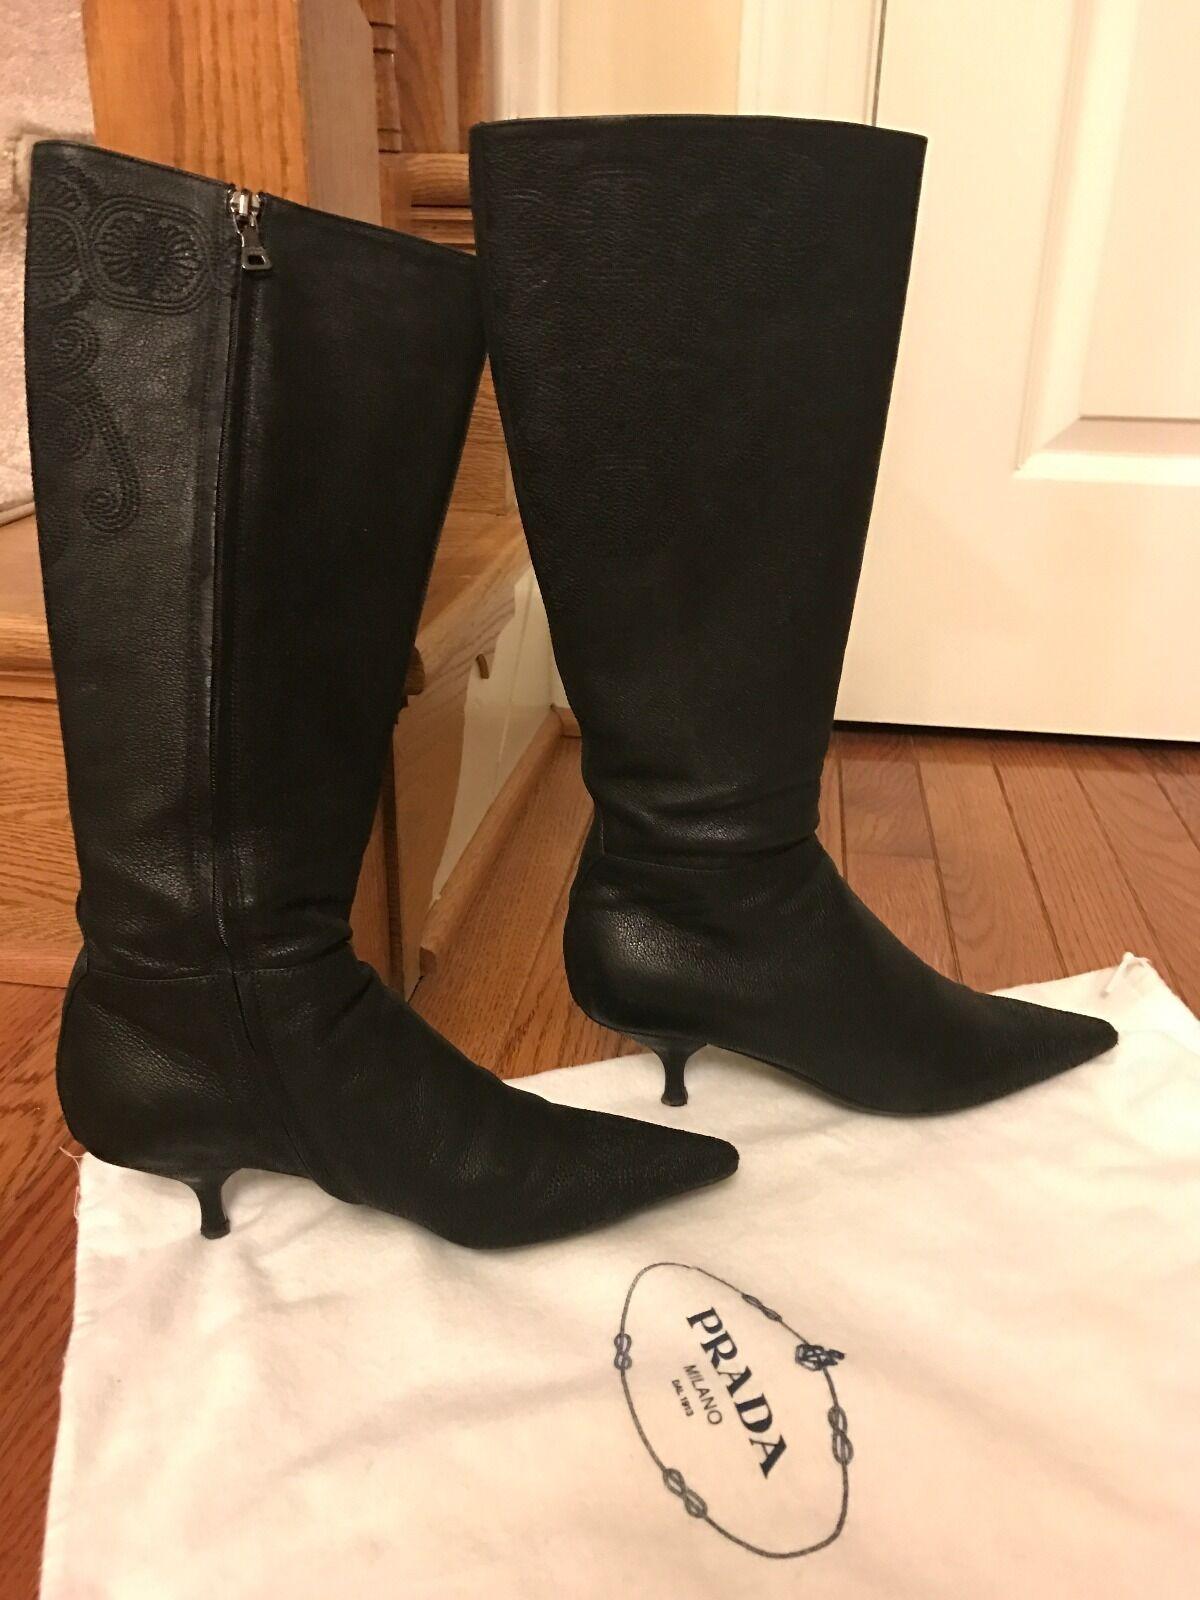 Prada Stitched Pattern Black Leather Knee-high Kitten Heel Boots, Sz 35.5/5.5